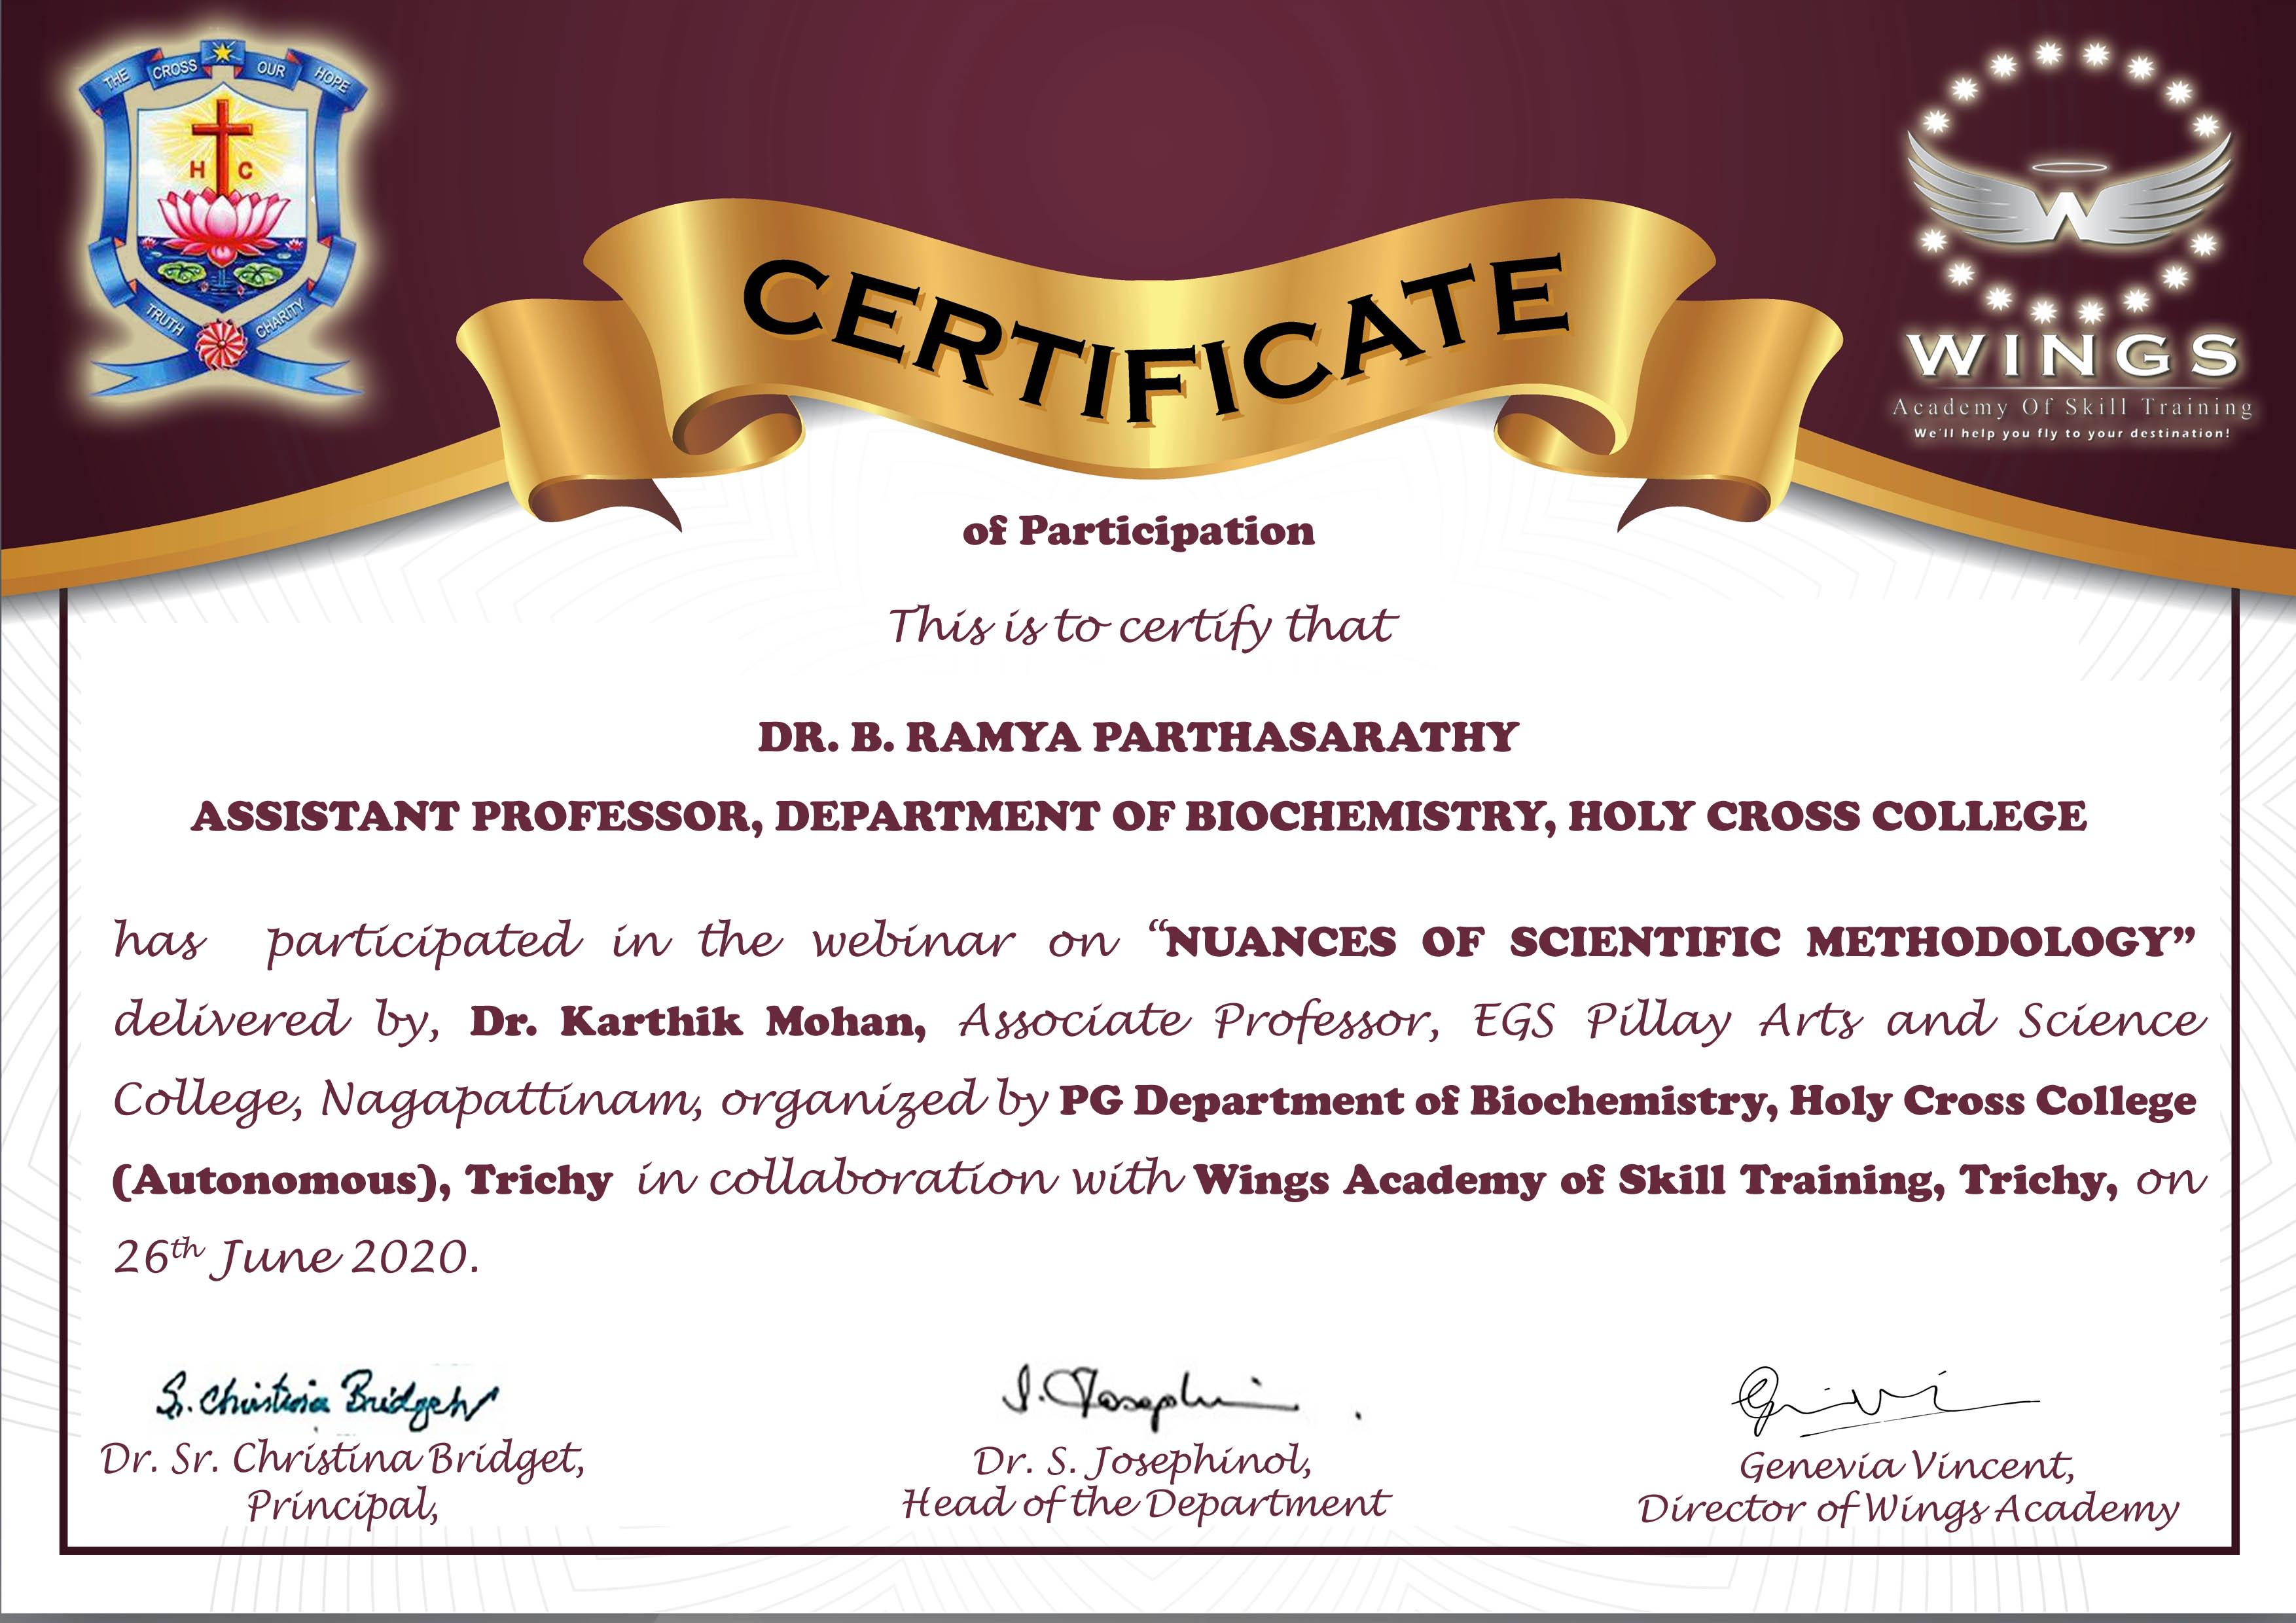 DR. B. RAMYA PARTHASARATHY.jpg